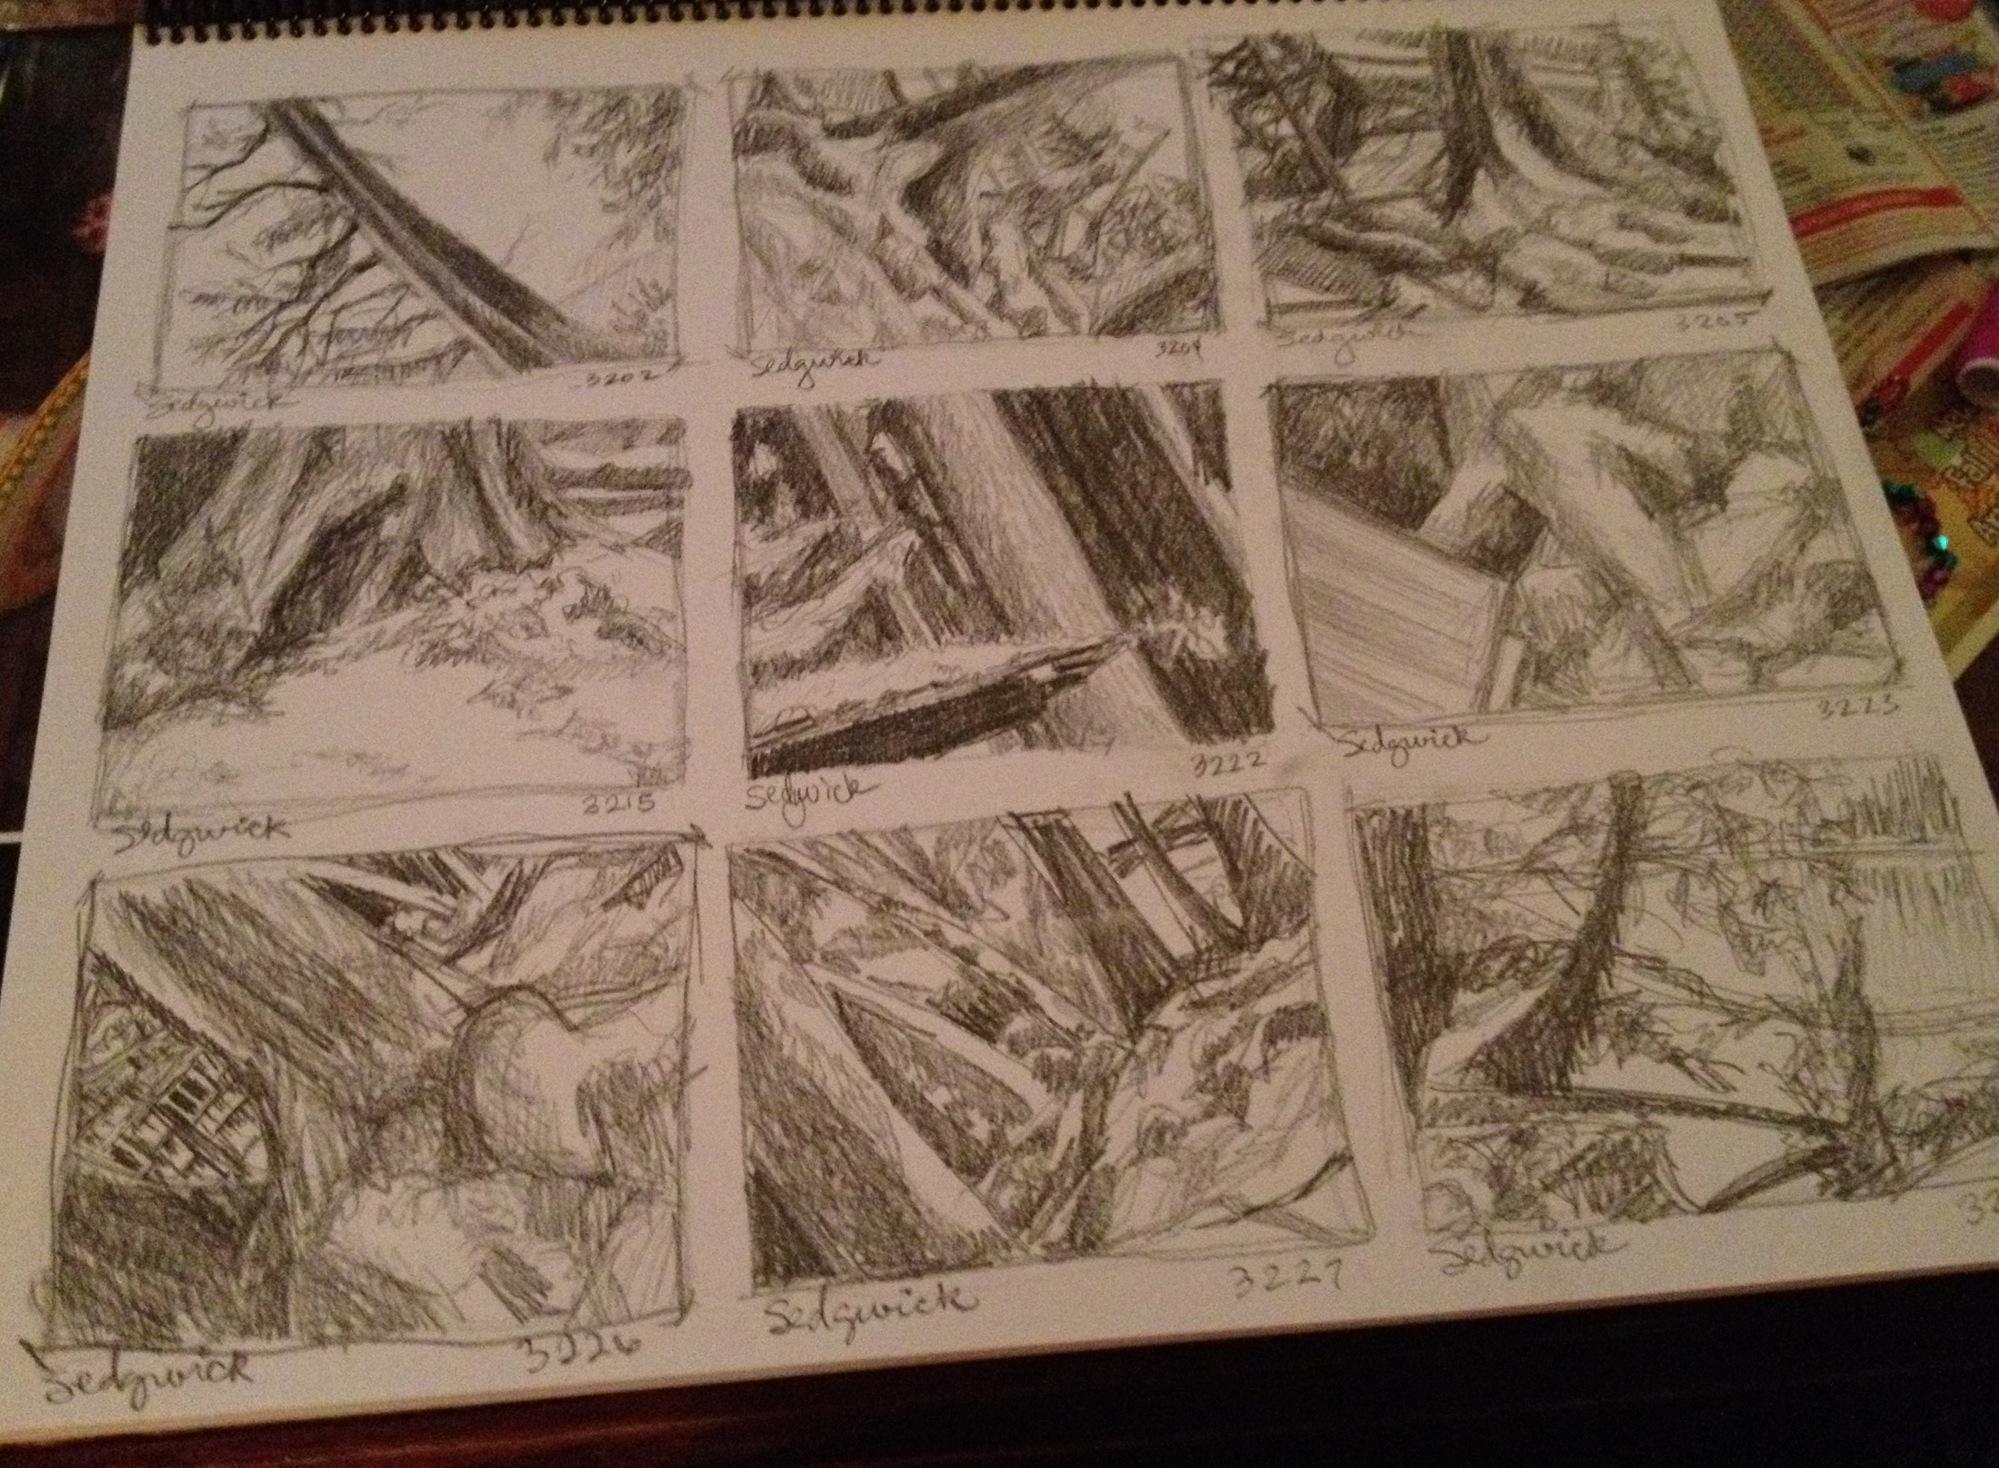 Thumbnail Sketches 4 - Janice Tanton, Gwaii Haanas National Park